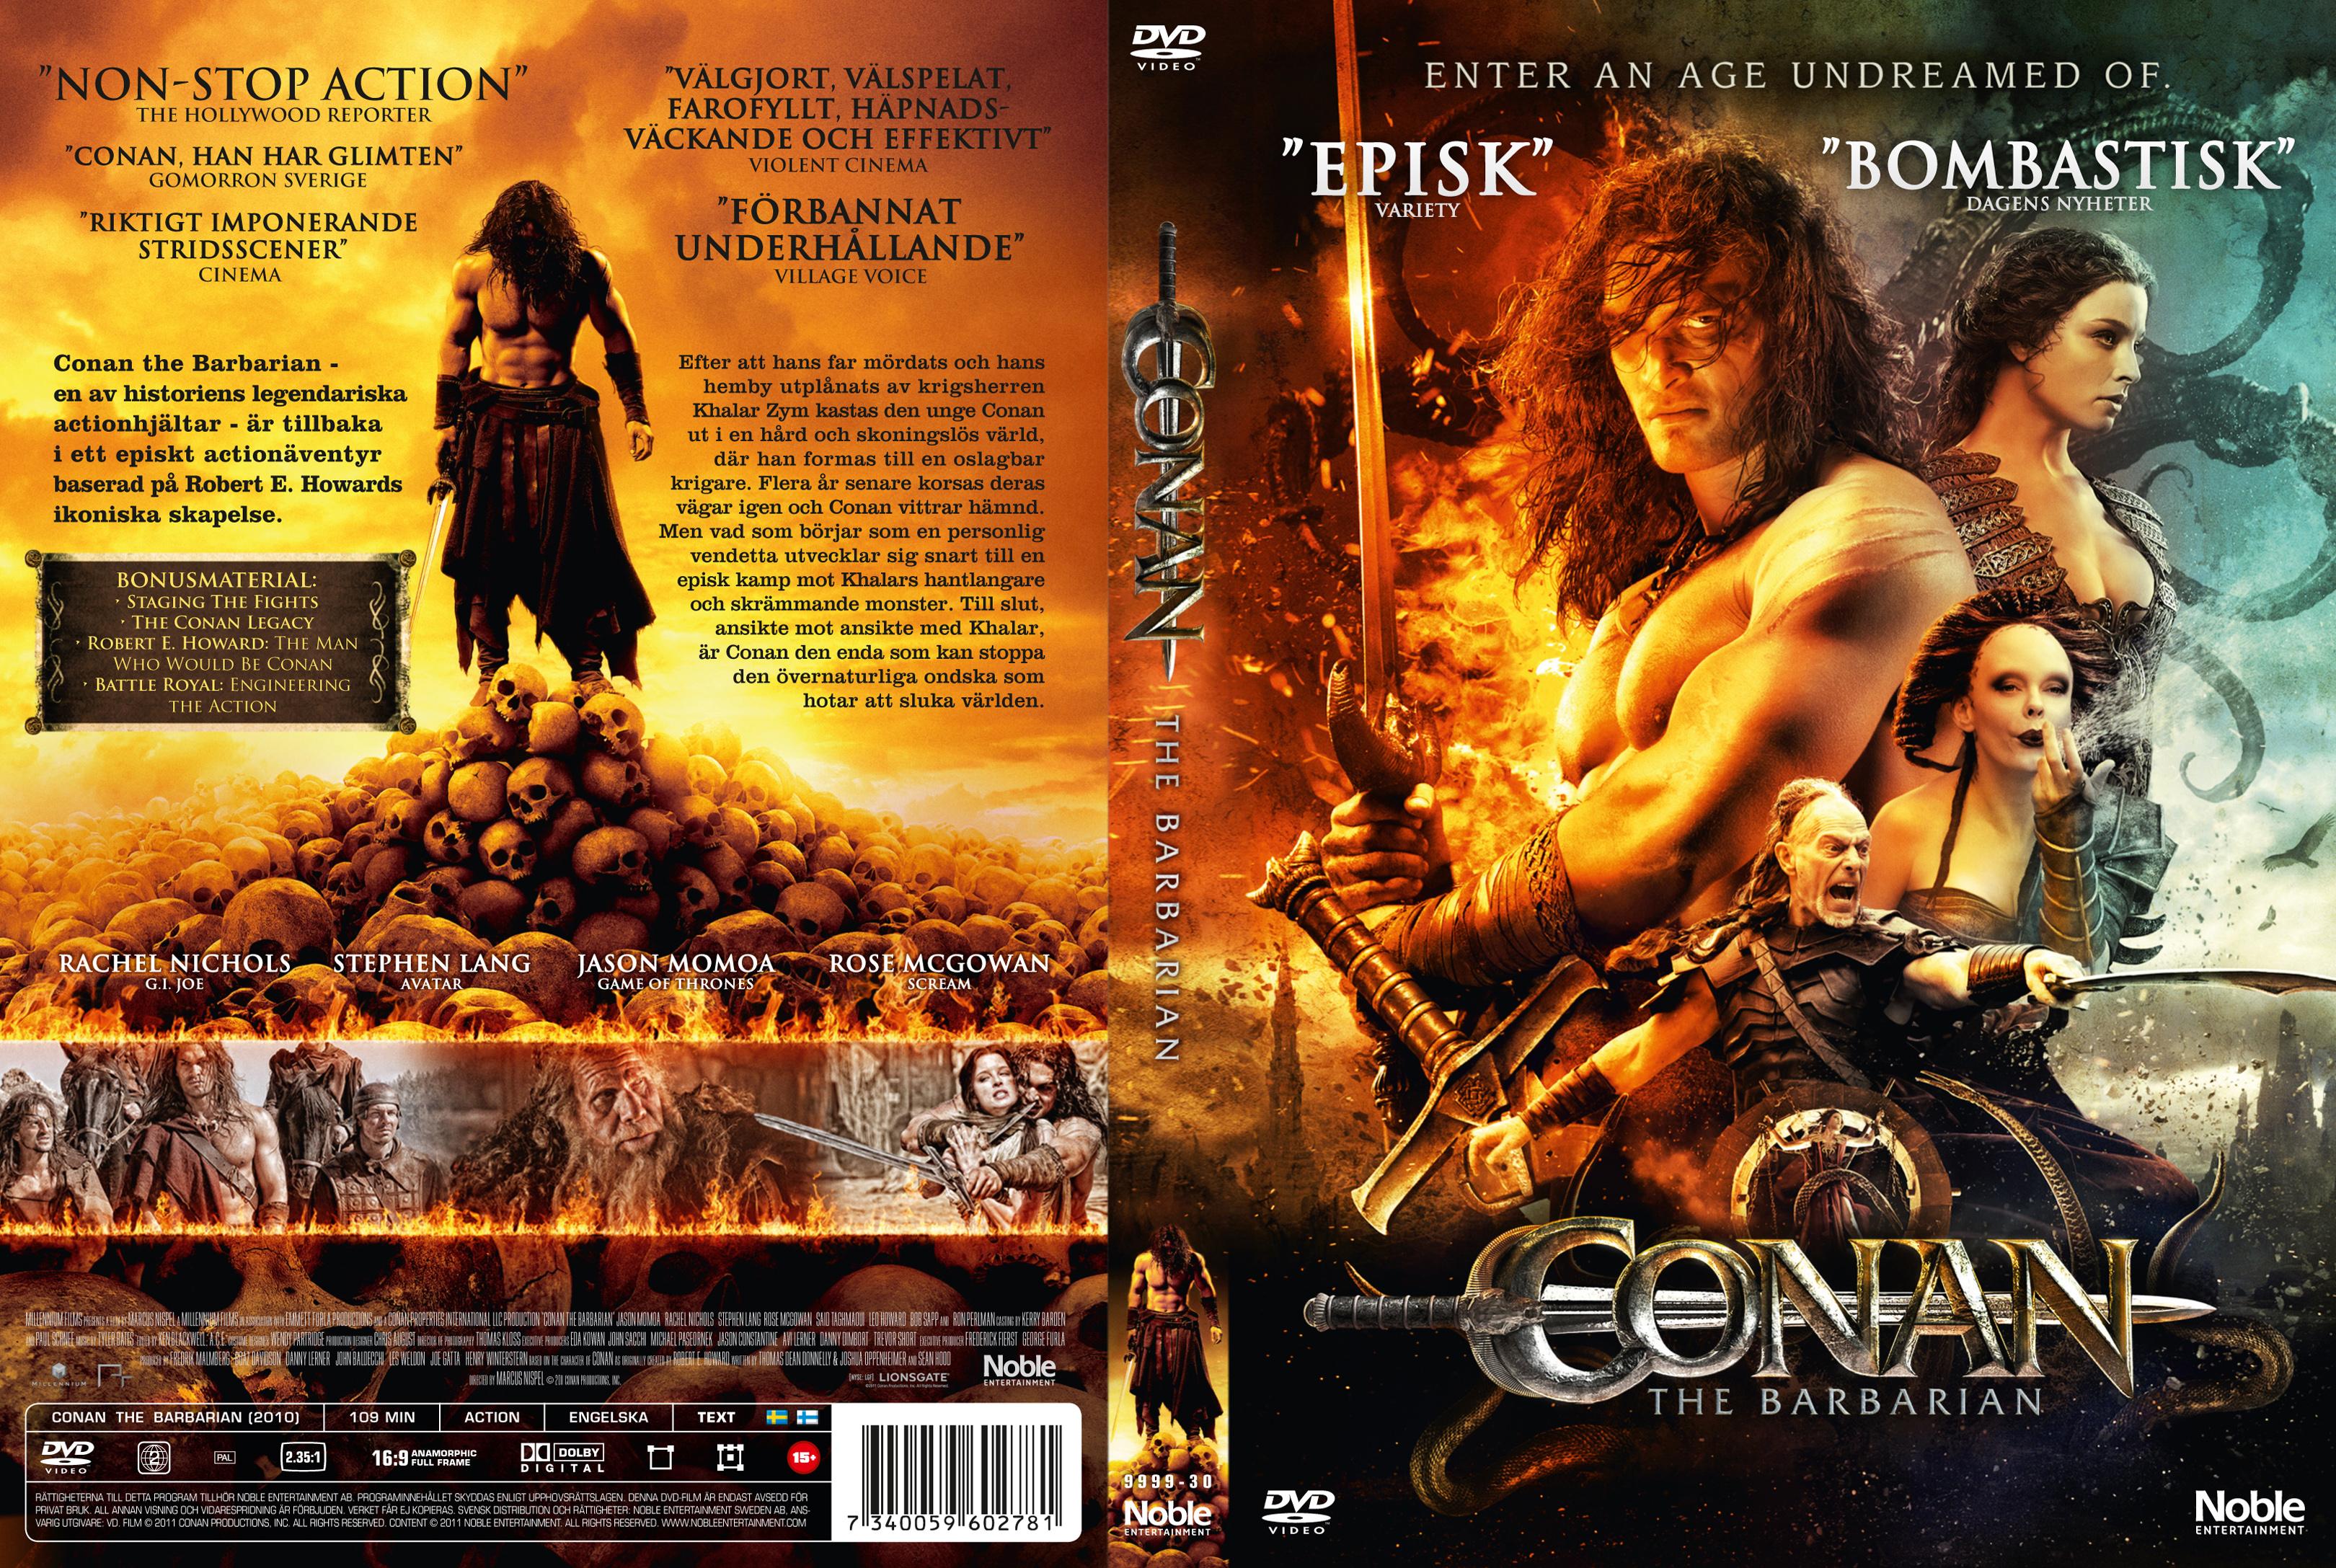 Conan 2011 Minimalist covers.box.sk ::: conan the barbarian (2011) - high quality dvd